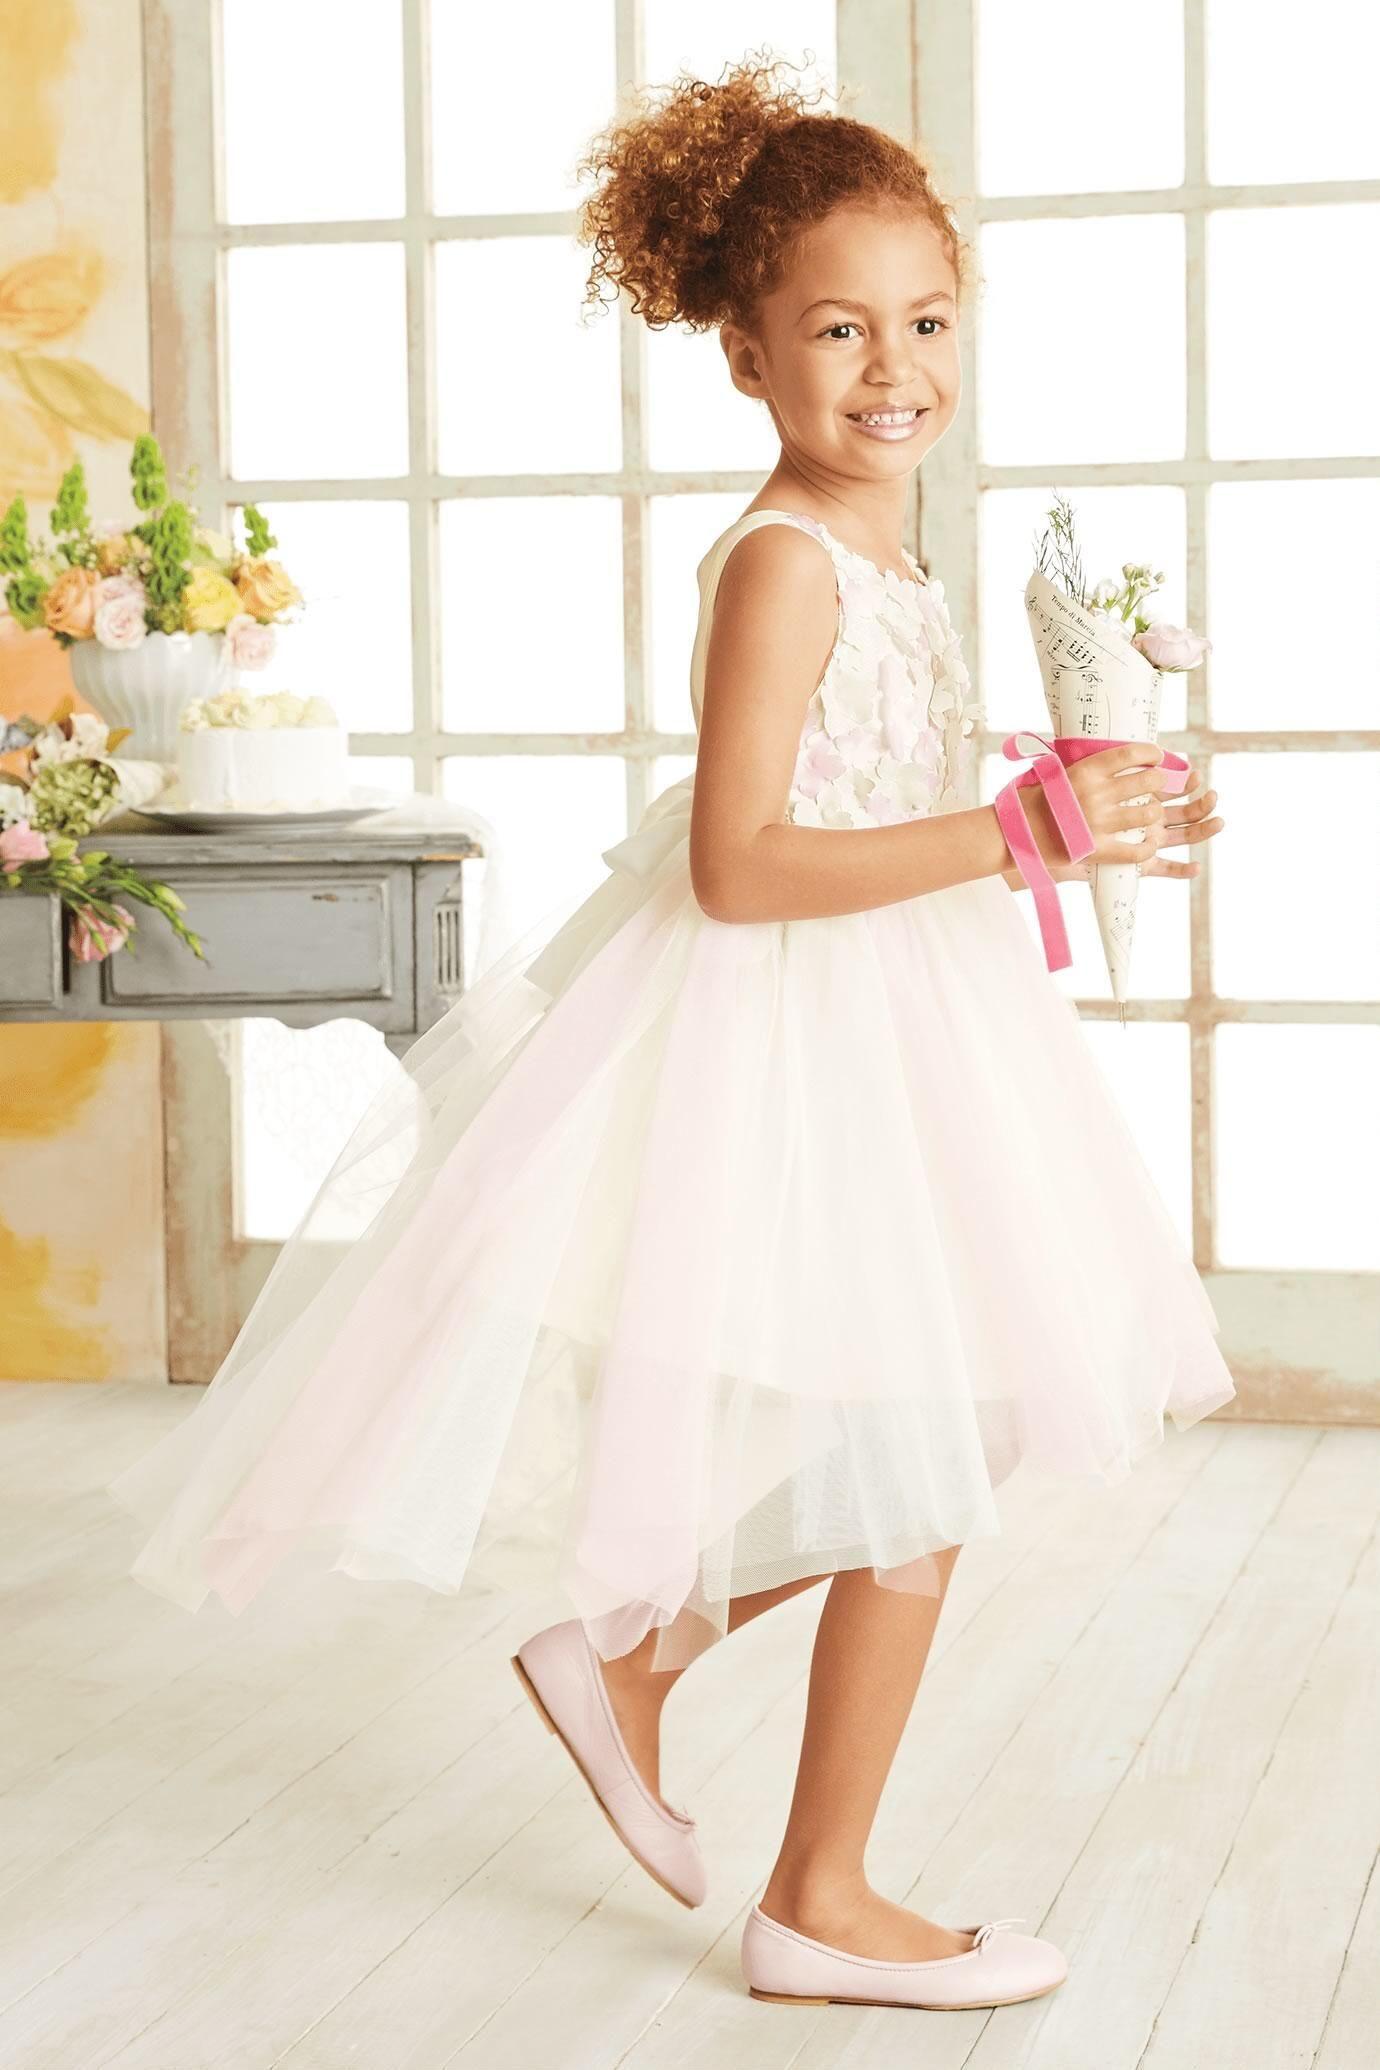 7dccfdc254b2 Scattered Flowers Dress: #Chasingfireflies $124.00 | Flower Girl ...